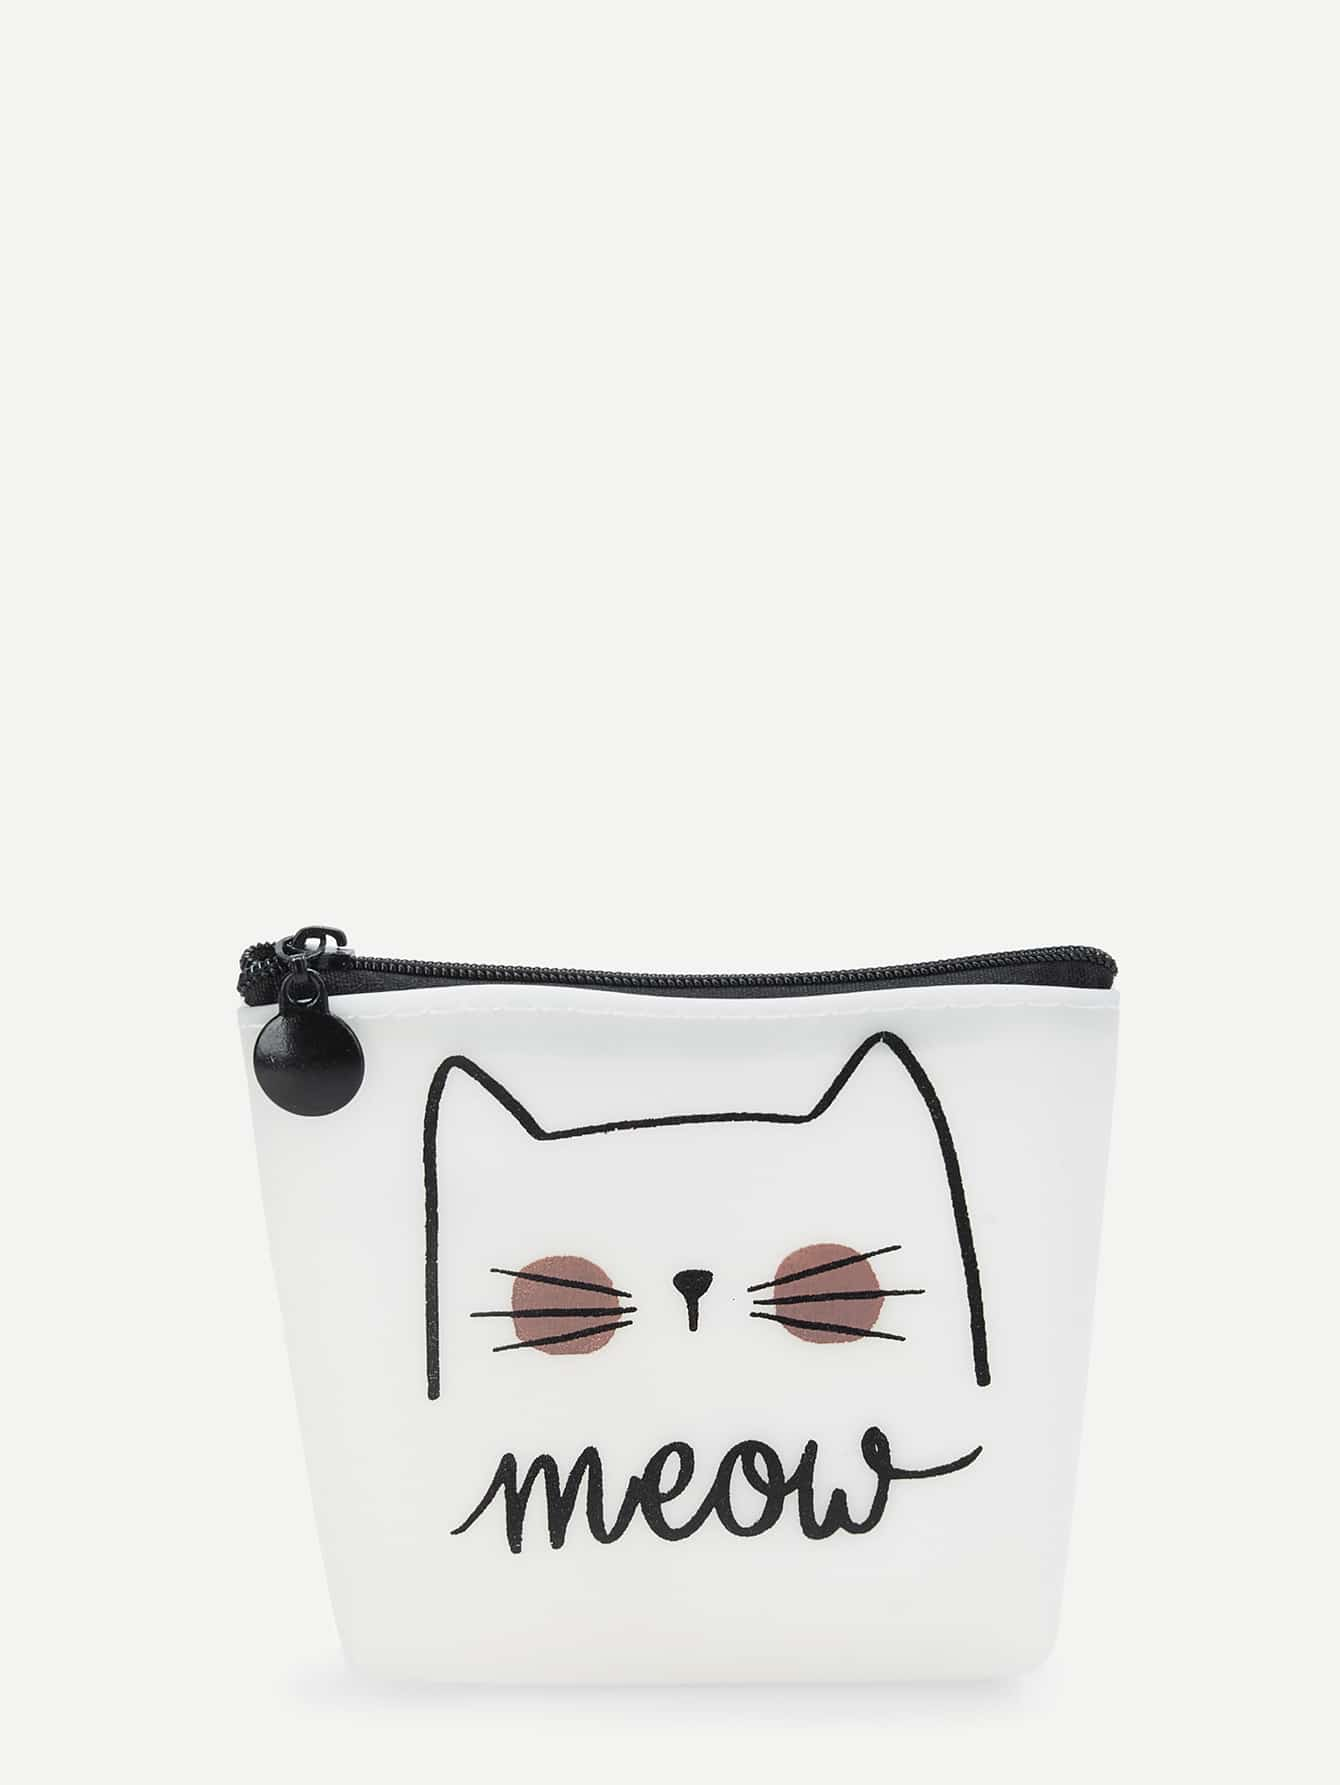 Cat Print Makeup Bag makeup organizer travel bag women cosmetic bags summer dumpling clutch women packages waterproof cosmetic bag handbag